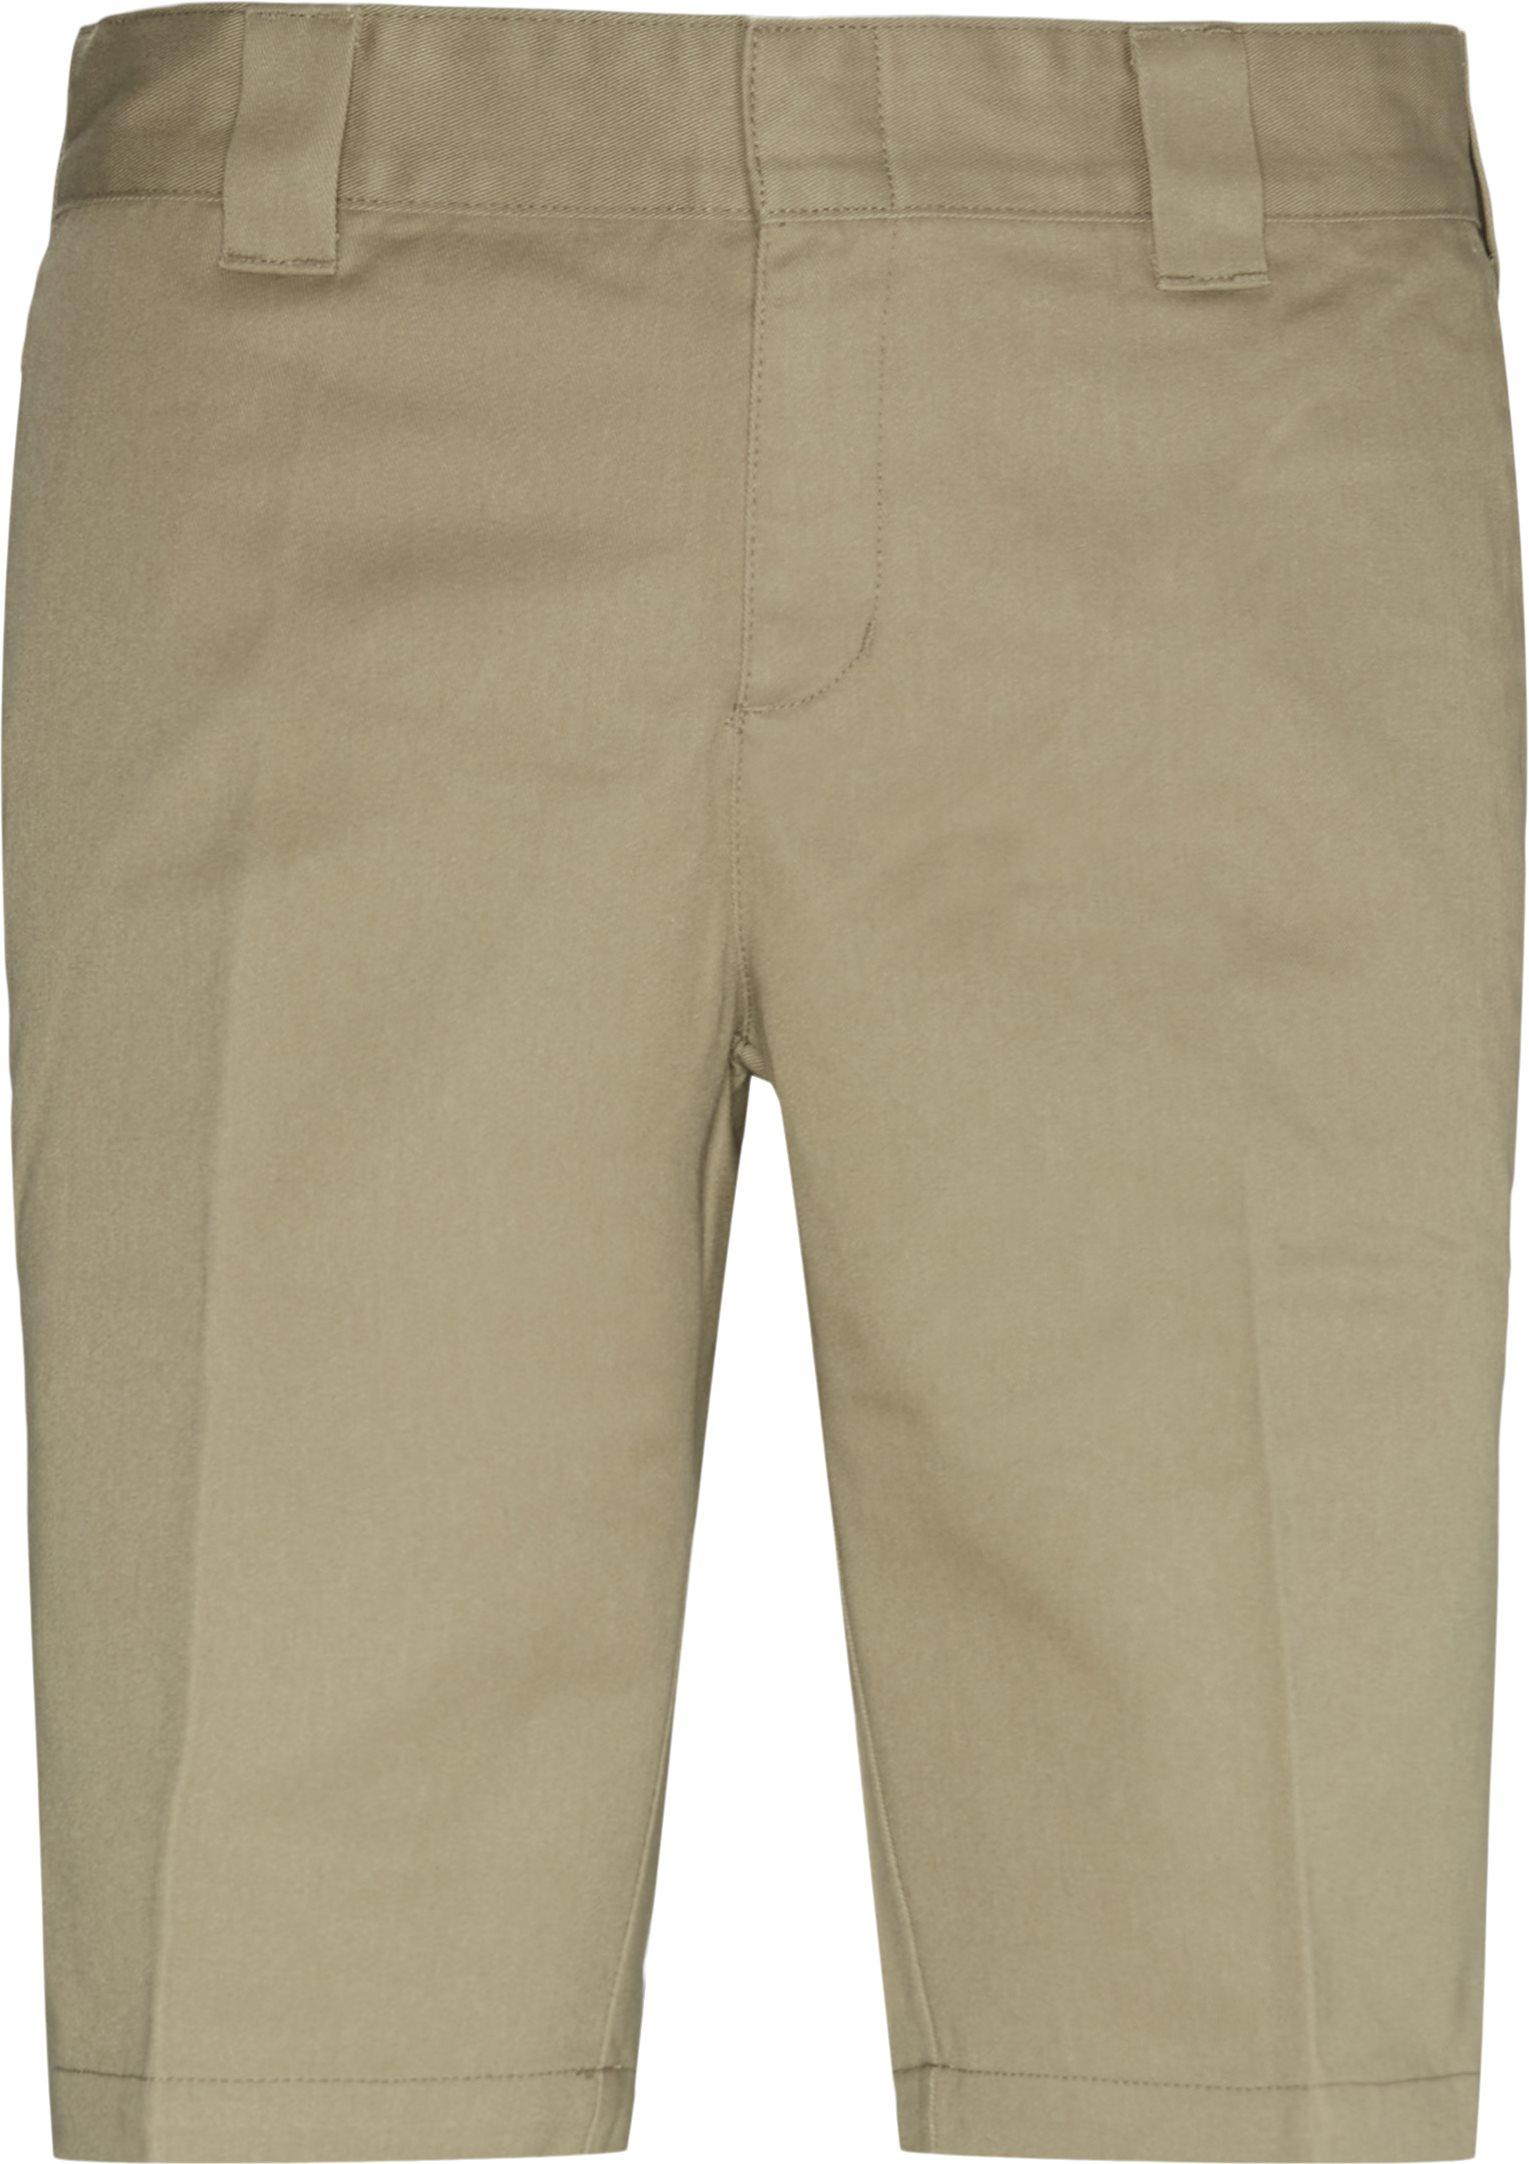 Cargo pants - Slim fit - Sand